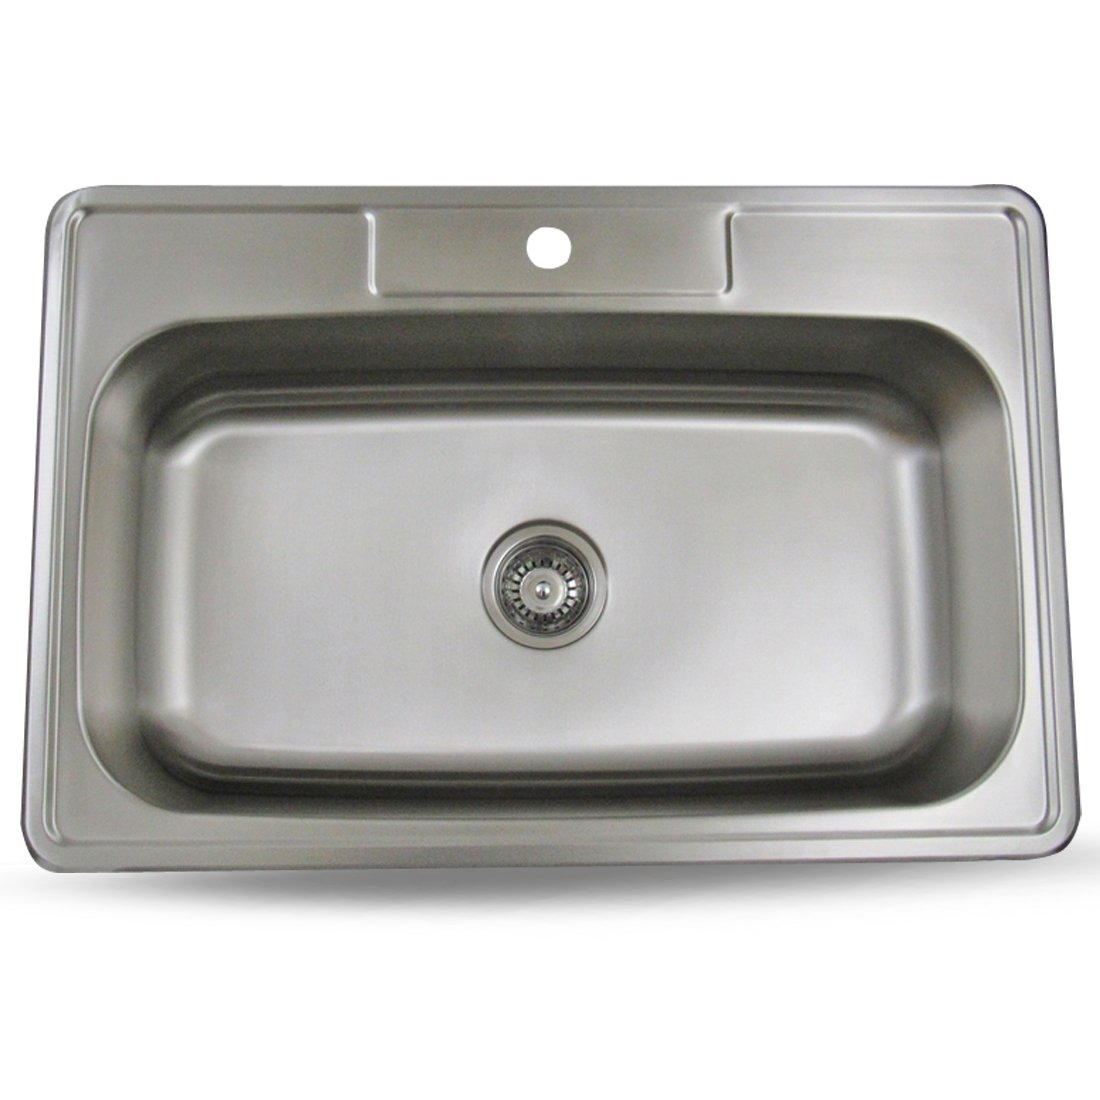 Sink Smart 33 Inch Top Mount Single Bowl Kitchen Sink Stainless Steel 18 Gauge – Satin Brush Finish